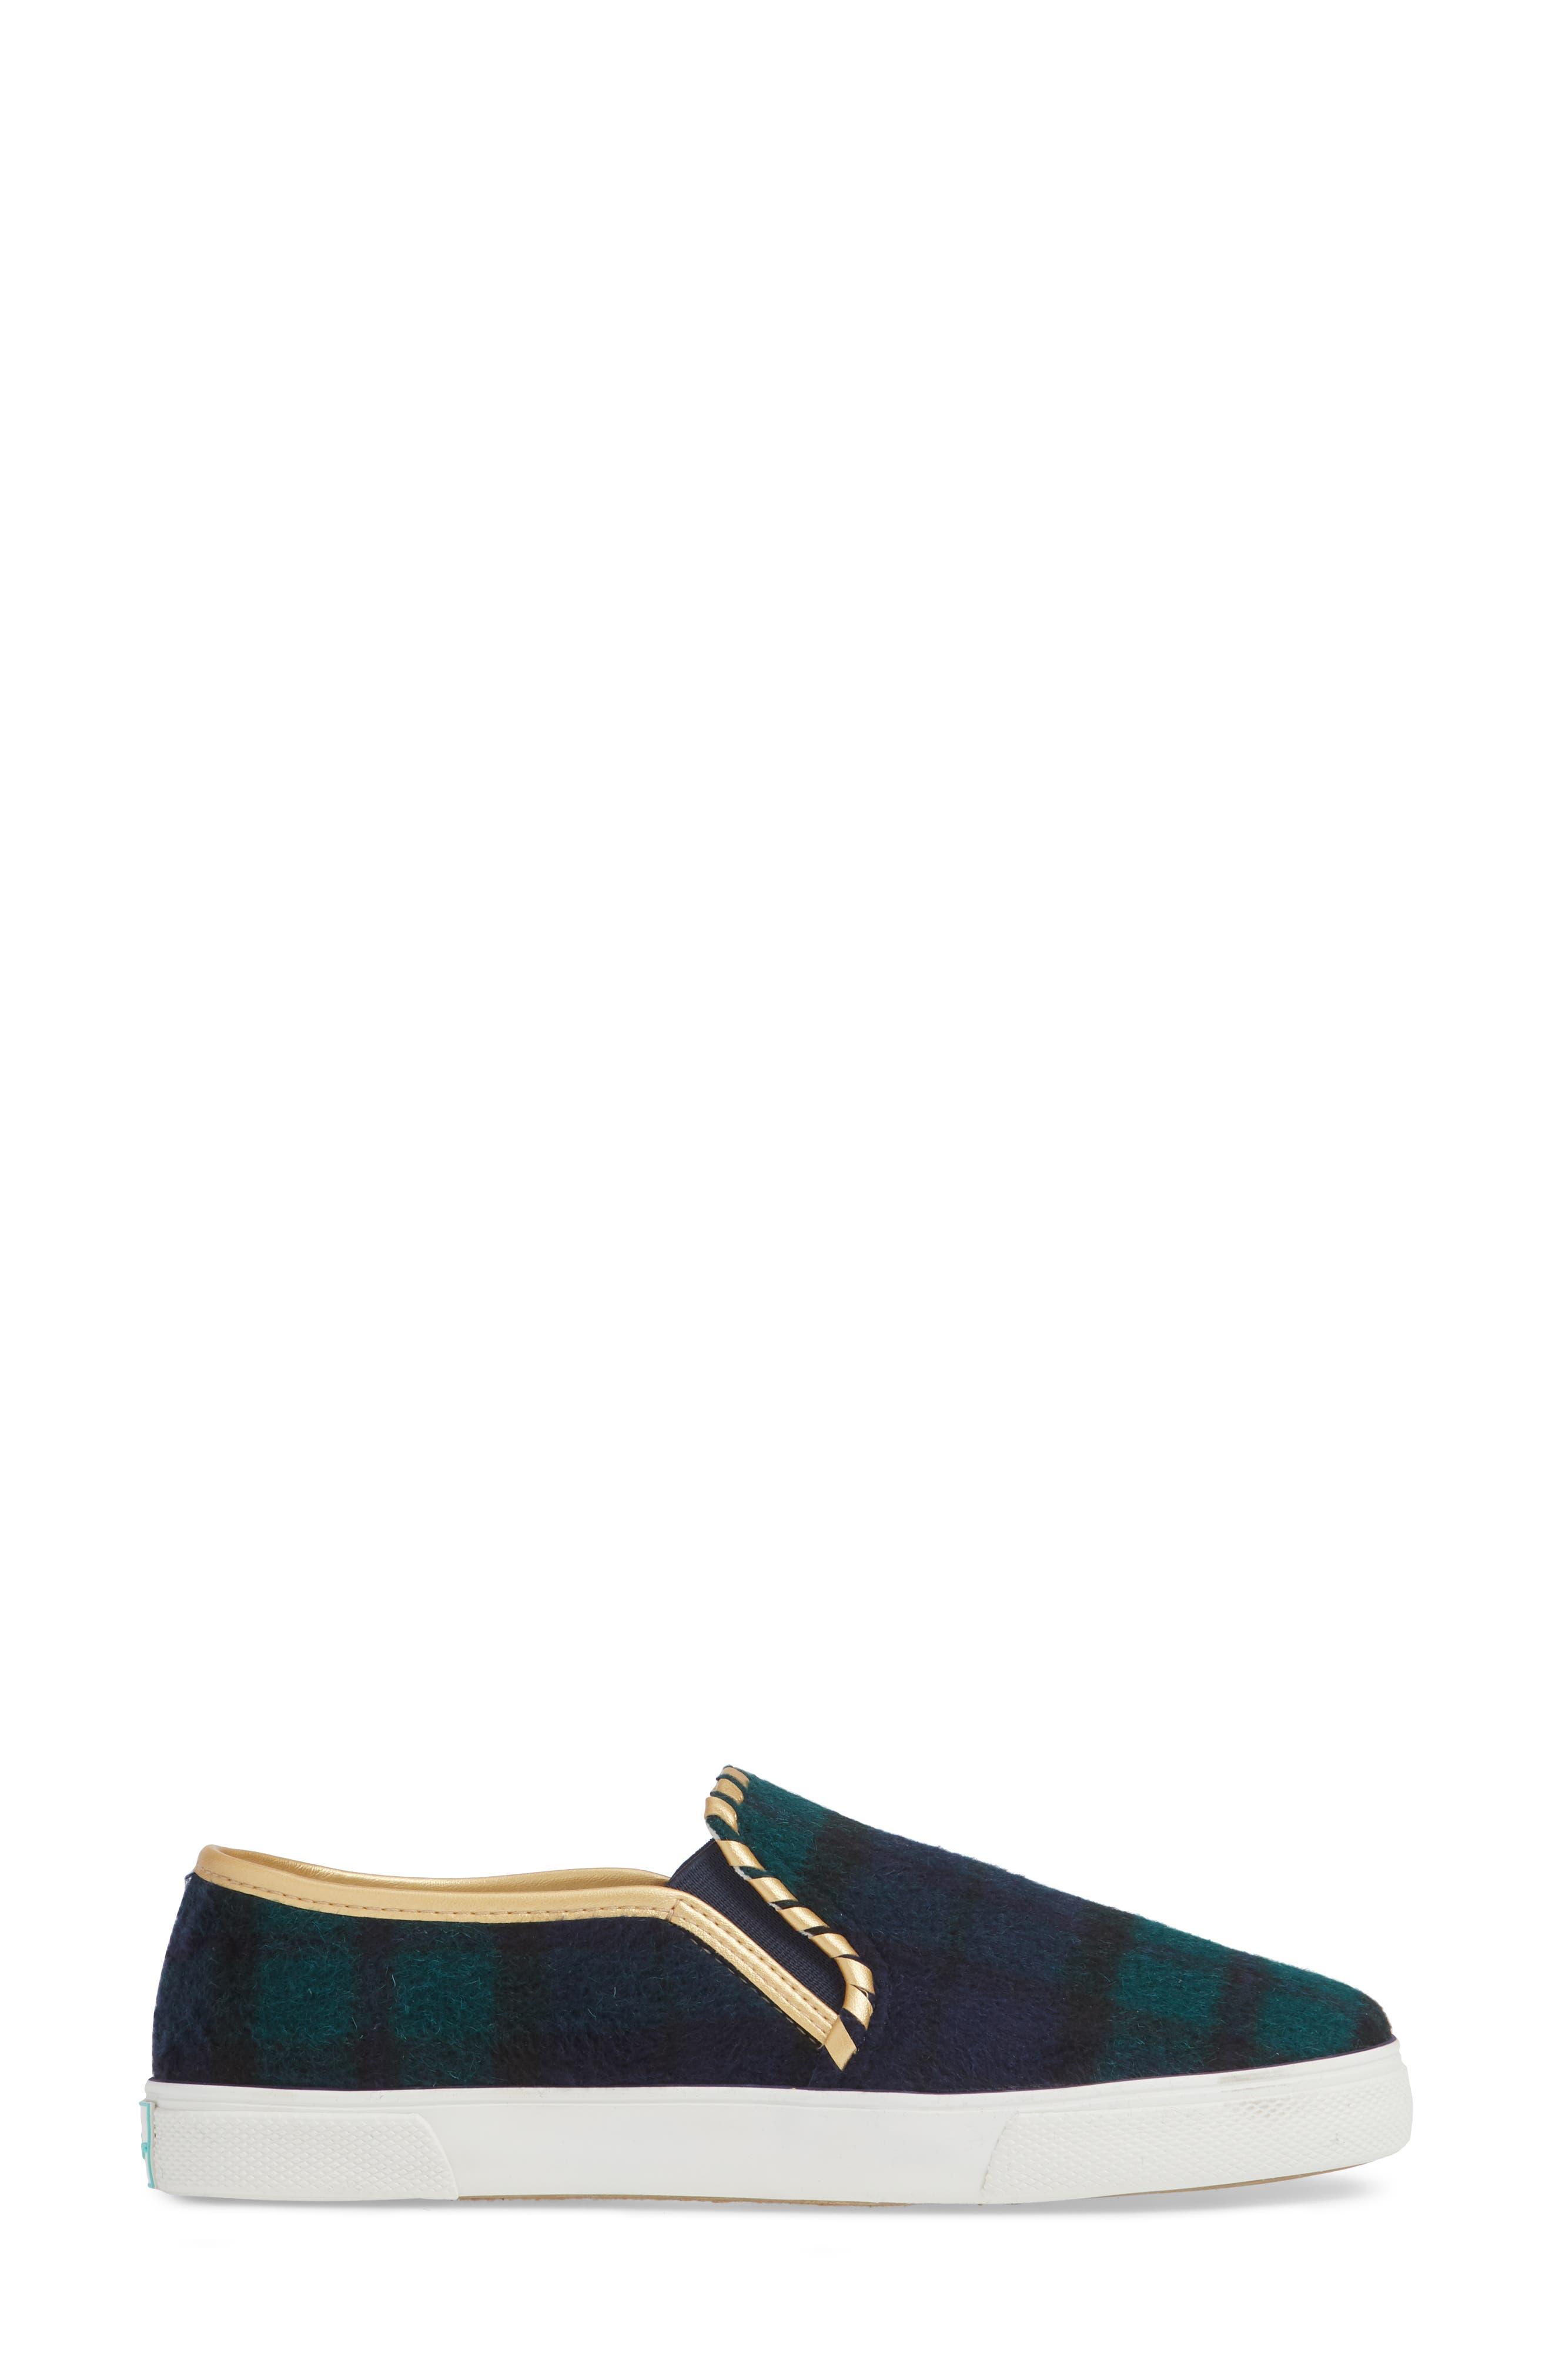 Brynne Slip-On Sneaker,                             Alternate thumbnail 3, color,                             MIDNIGHT/ GREEN FABRIC